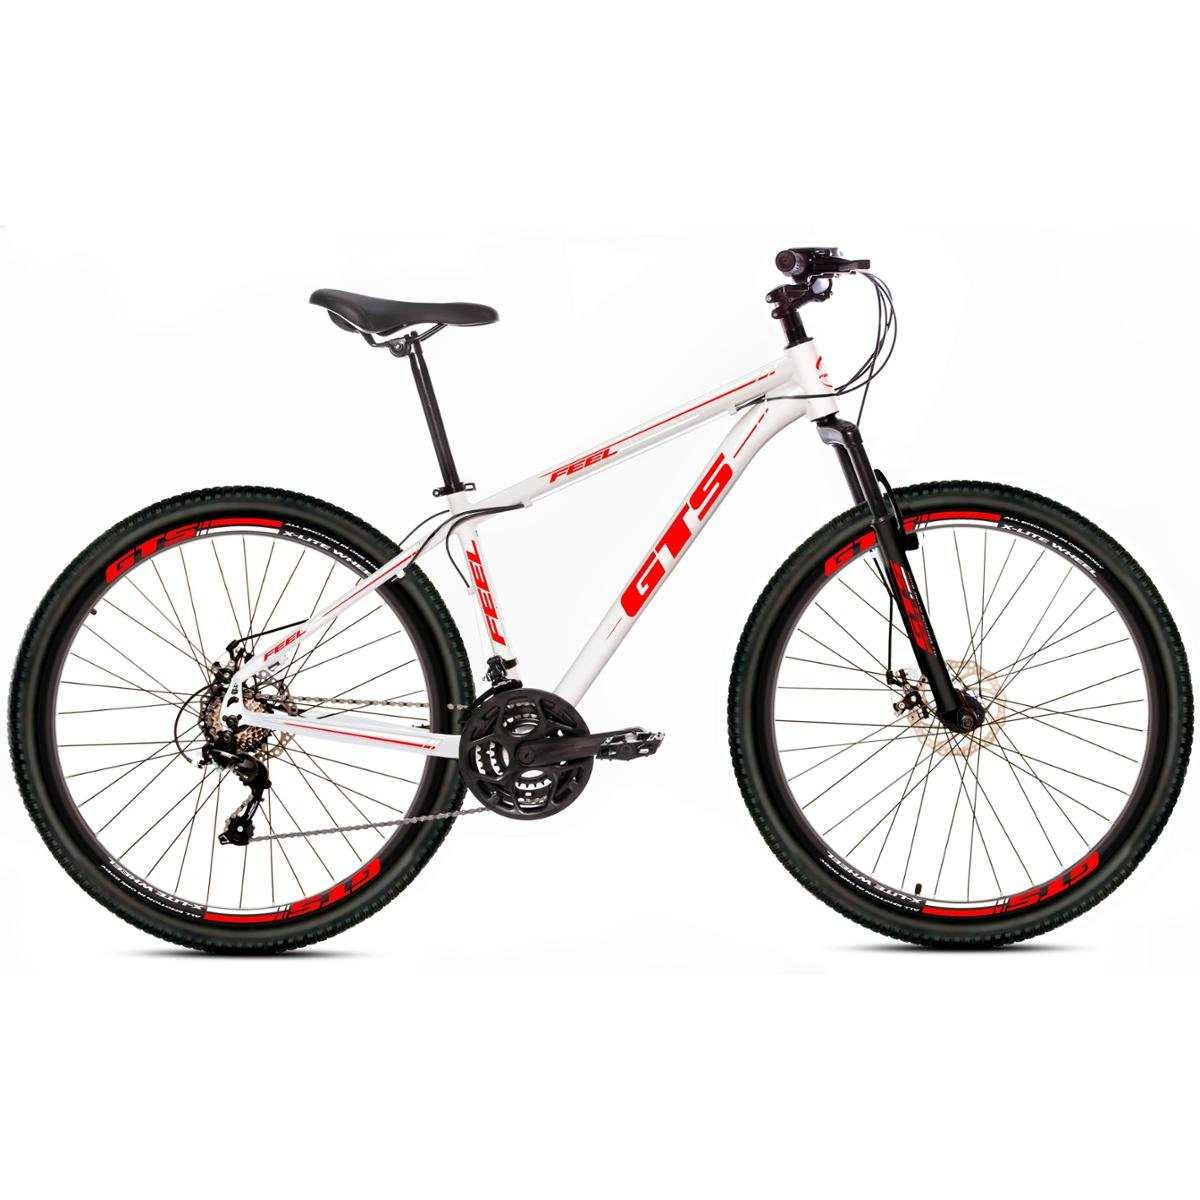 Bicicleta Gts Feel Disc T19 Aro 29 Susp. Dianteira 21 Marchas - Branco